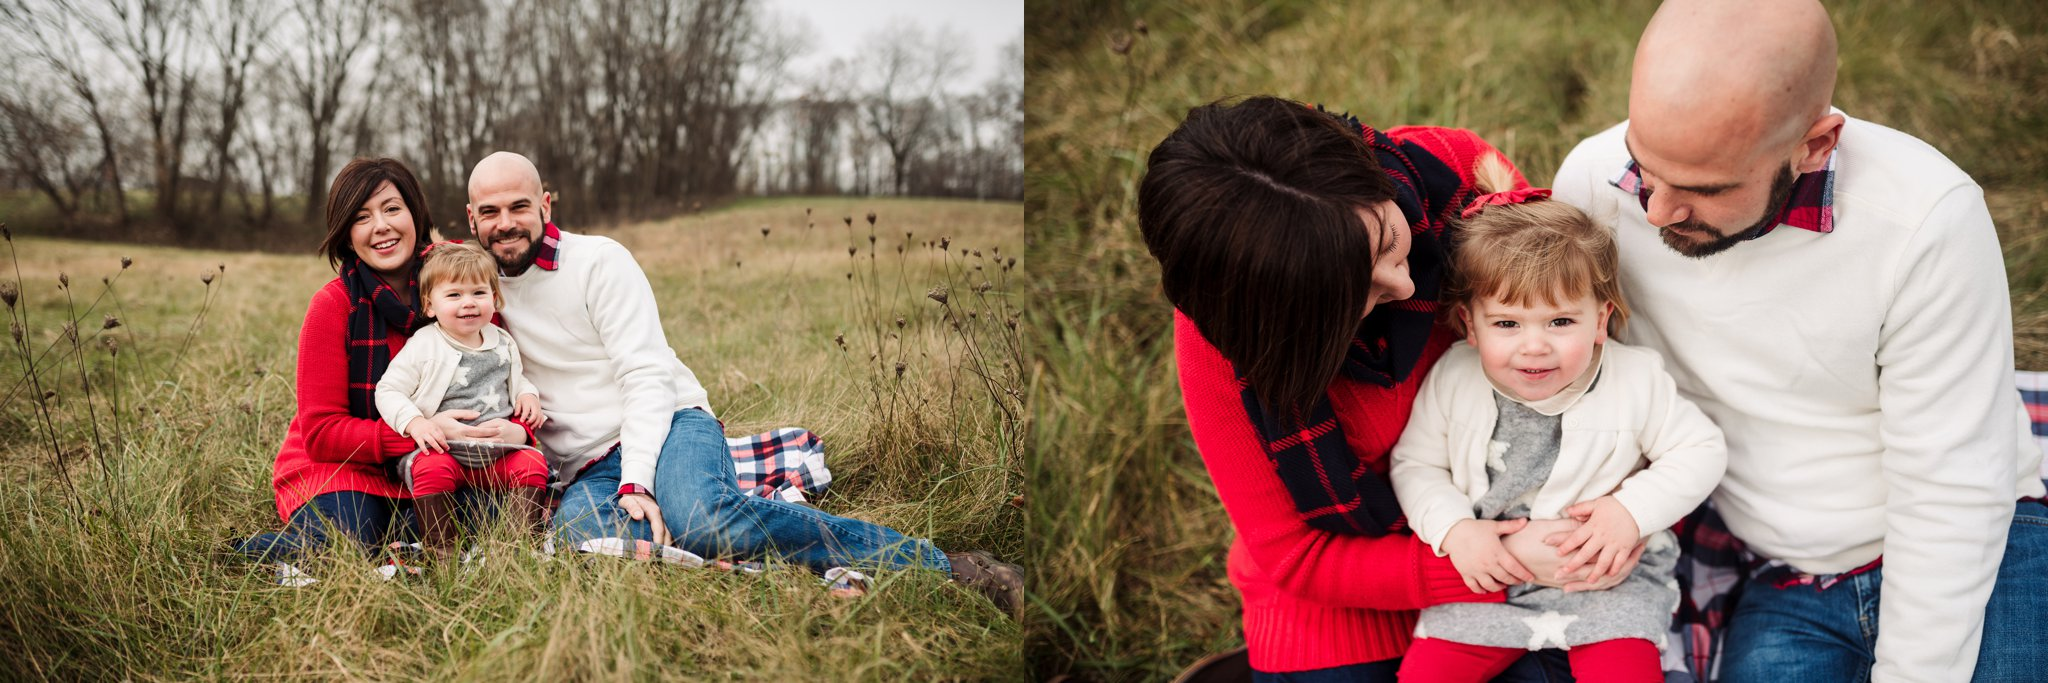 Sun Prairie Photography Burke Park WI Family sitting in field.jpg